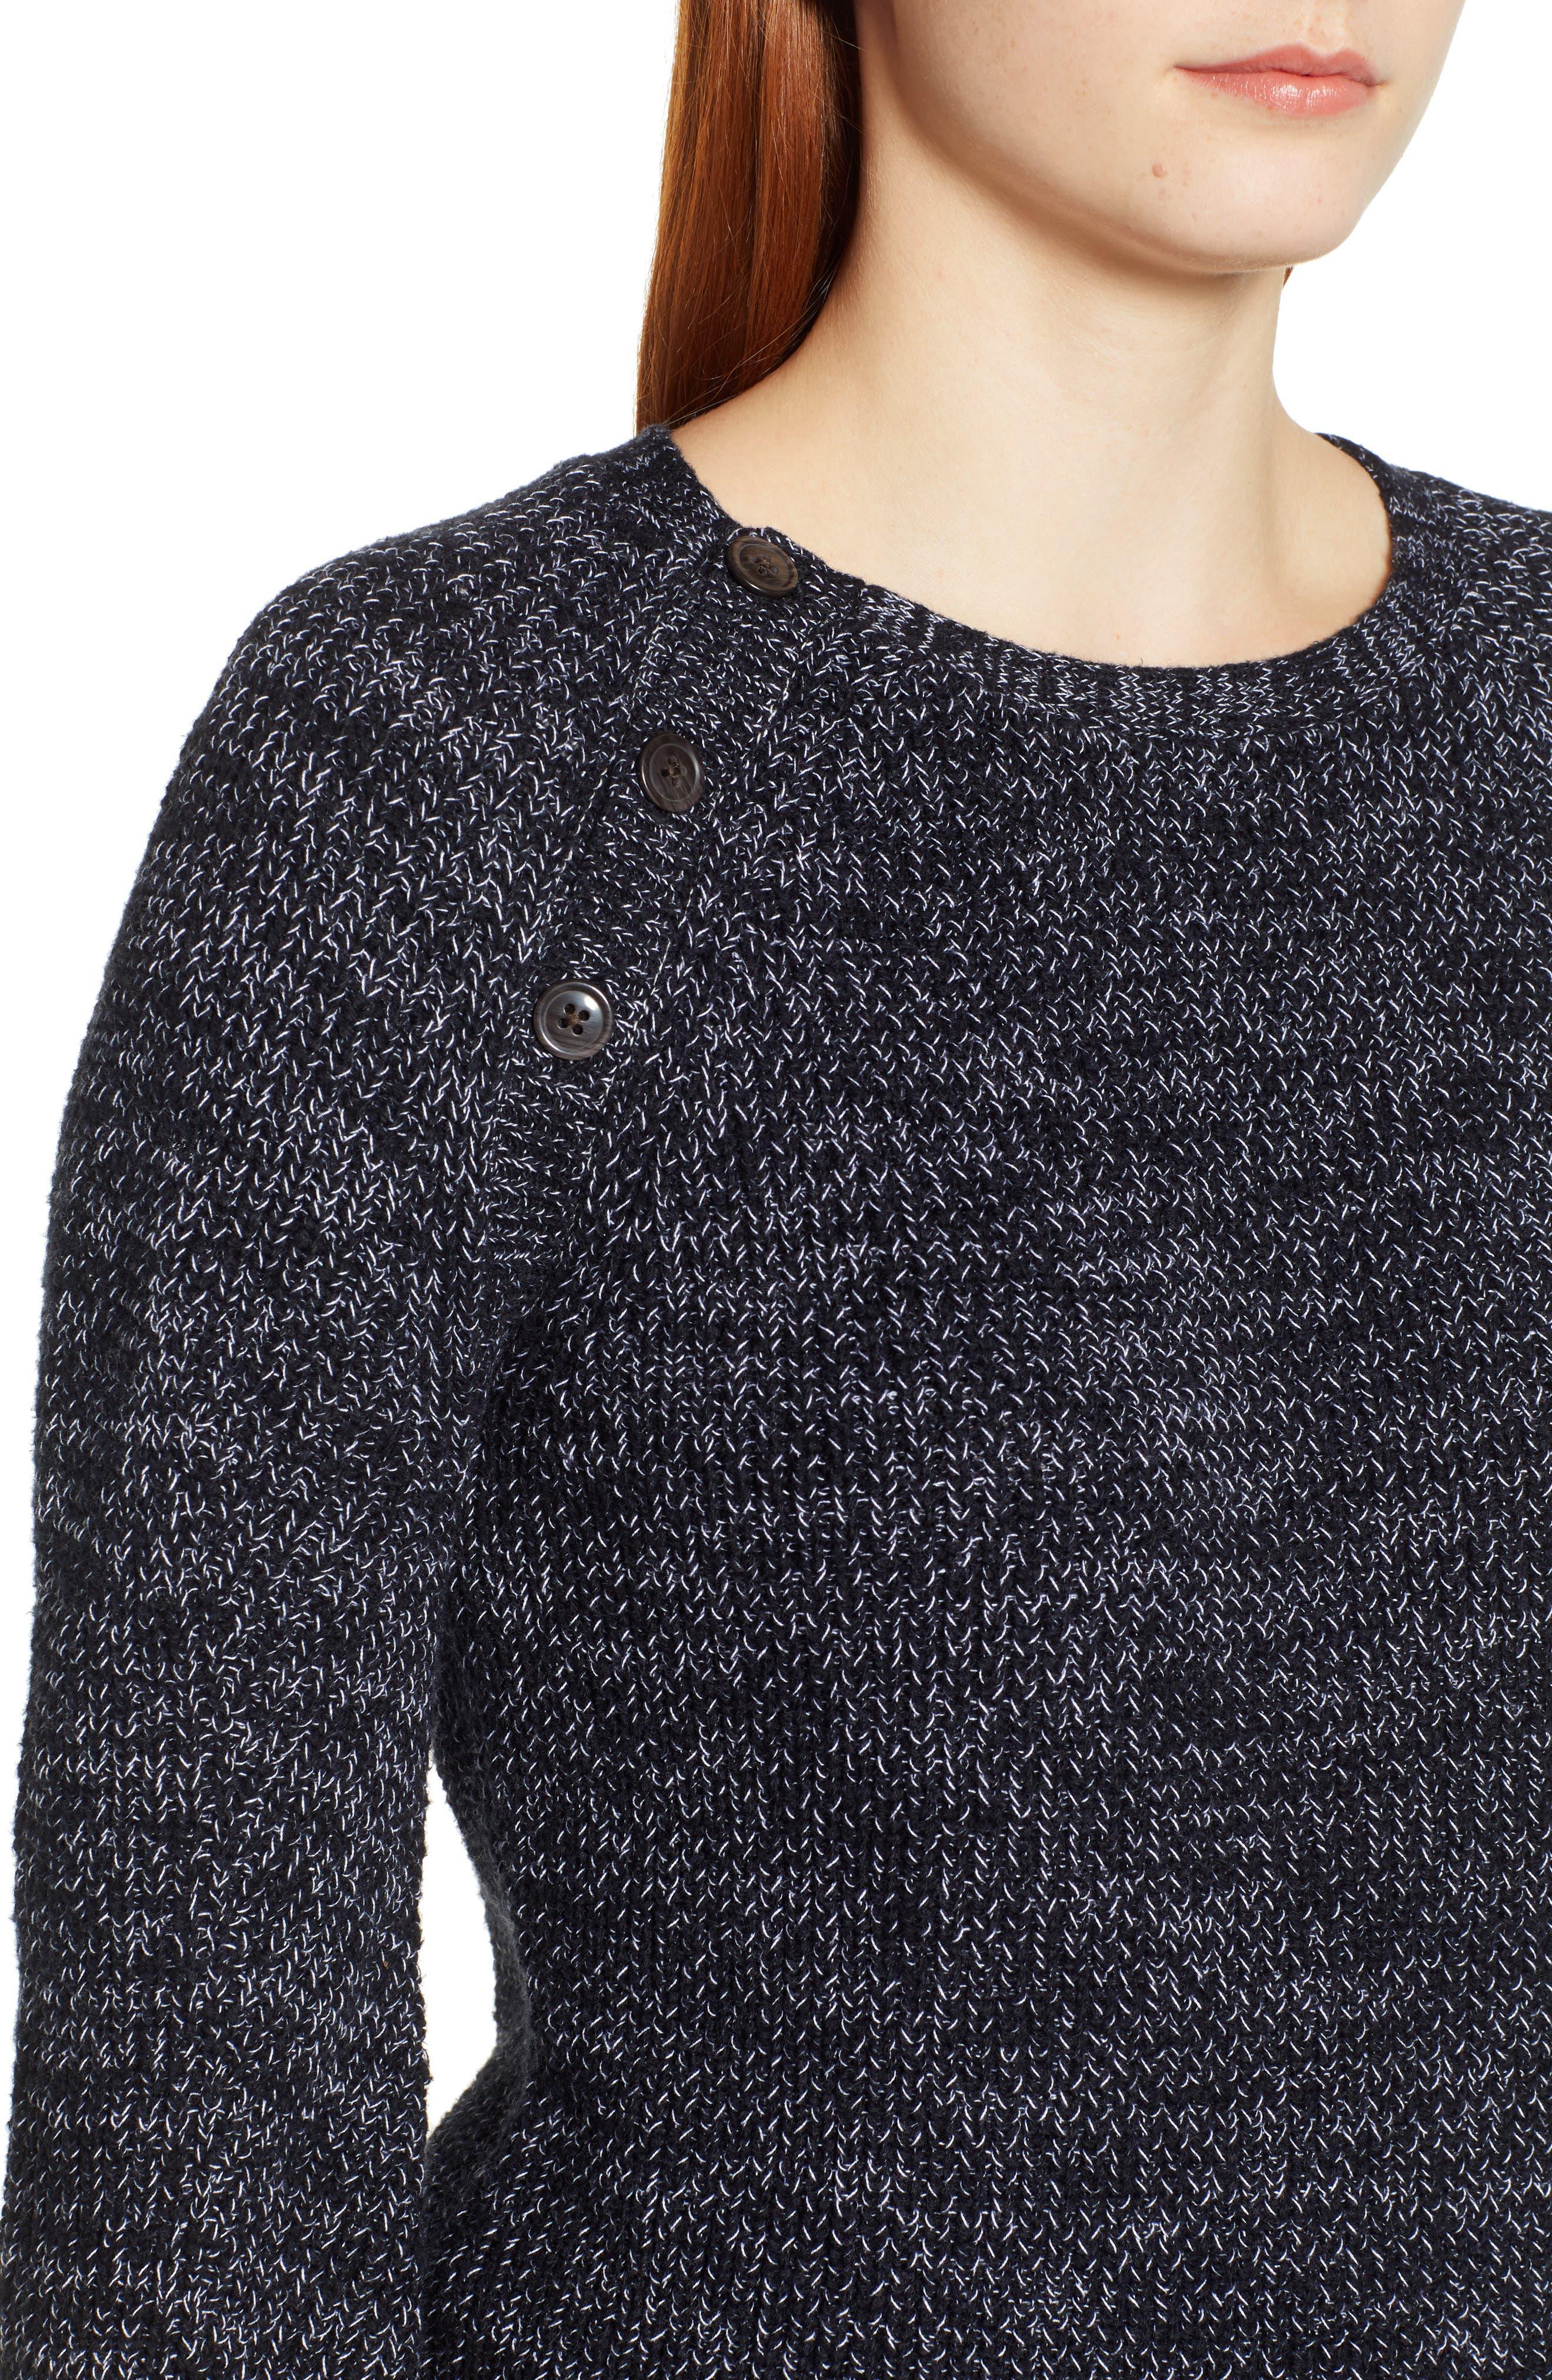 Raglan Sleeve Sweater,                             Alternate thumbnail 4, color,                             BLACK CREW MARL